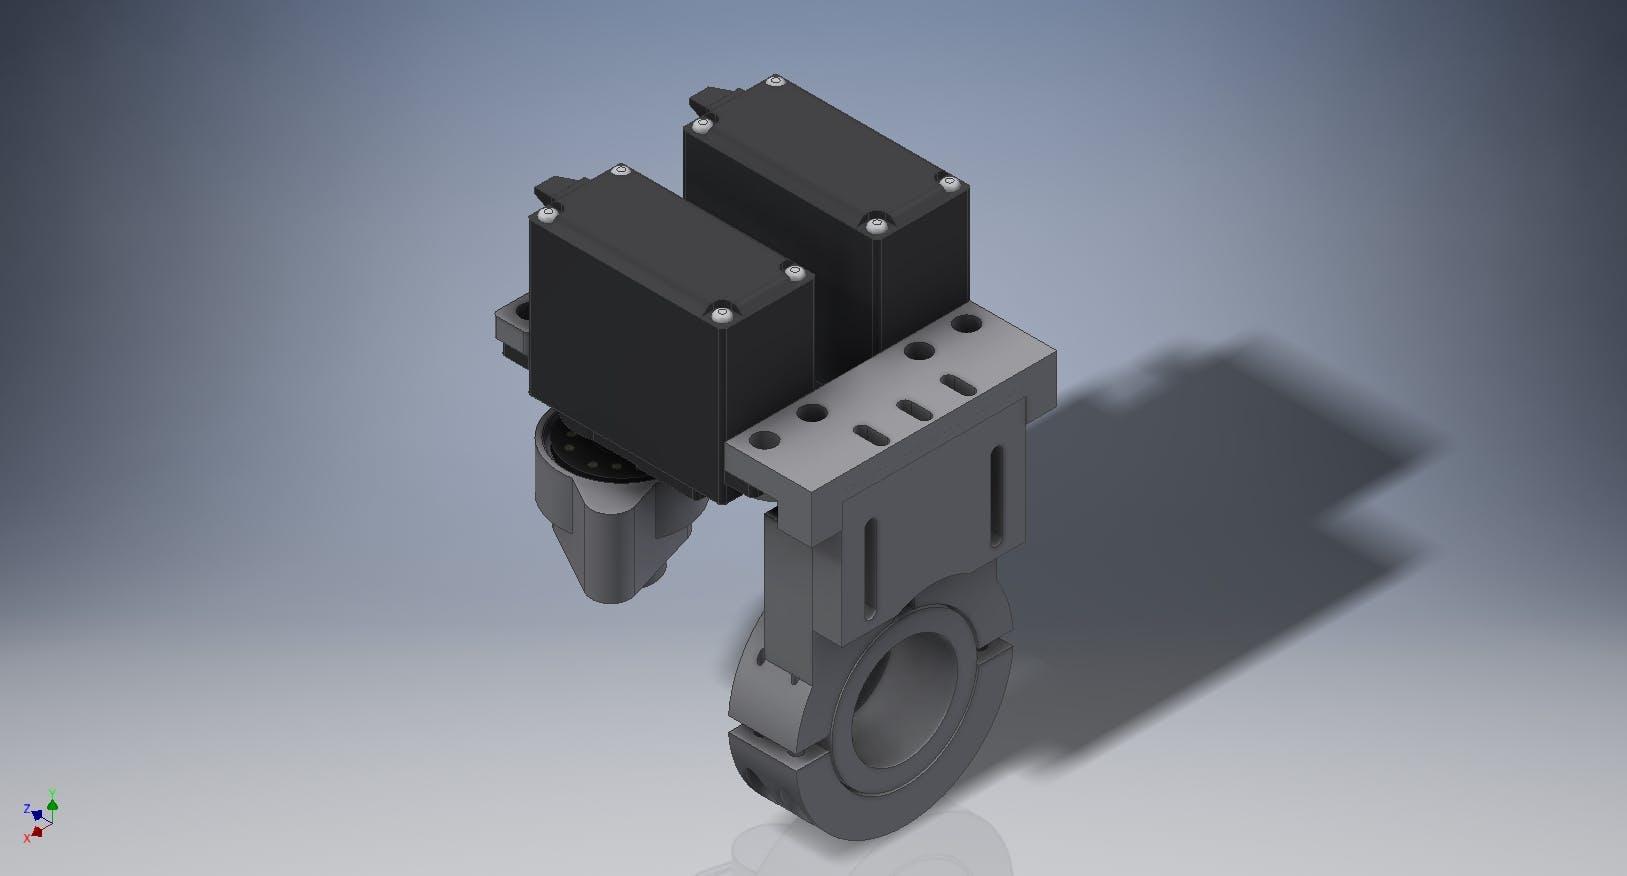 CAD Render of our Temperature Mixer